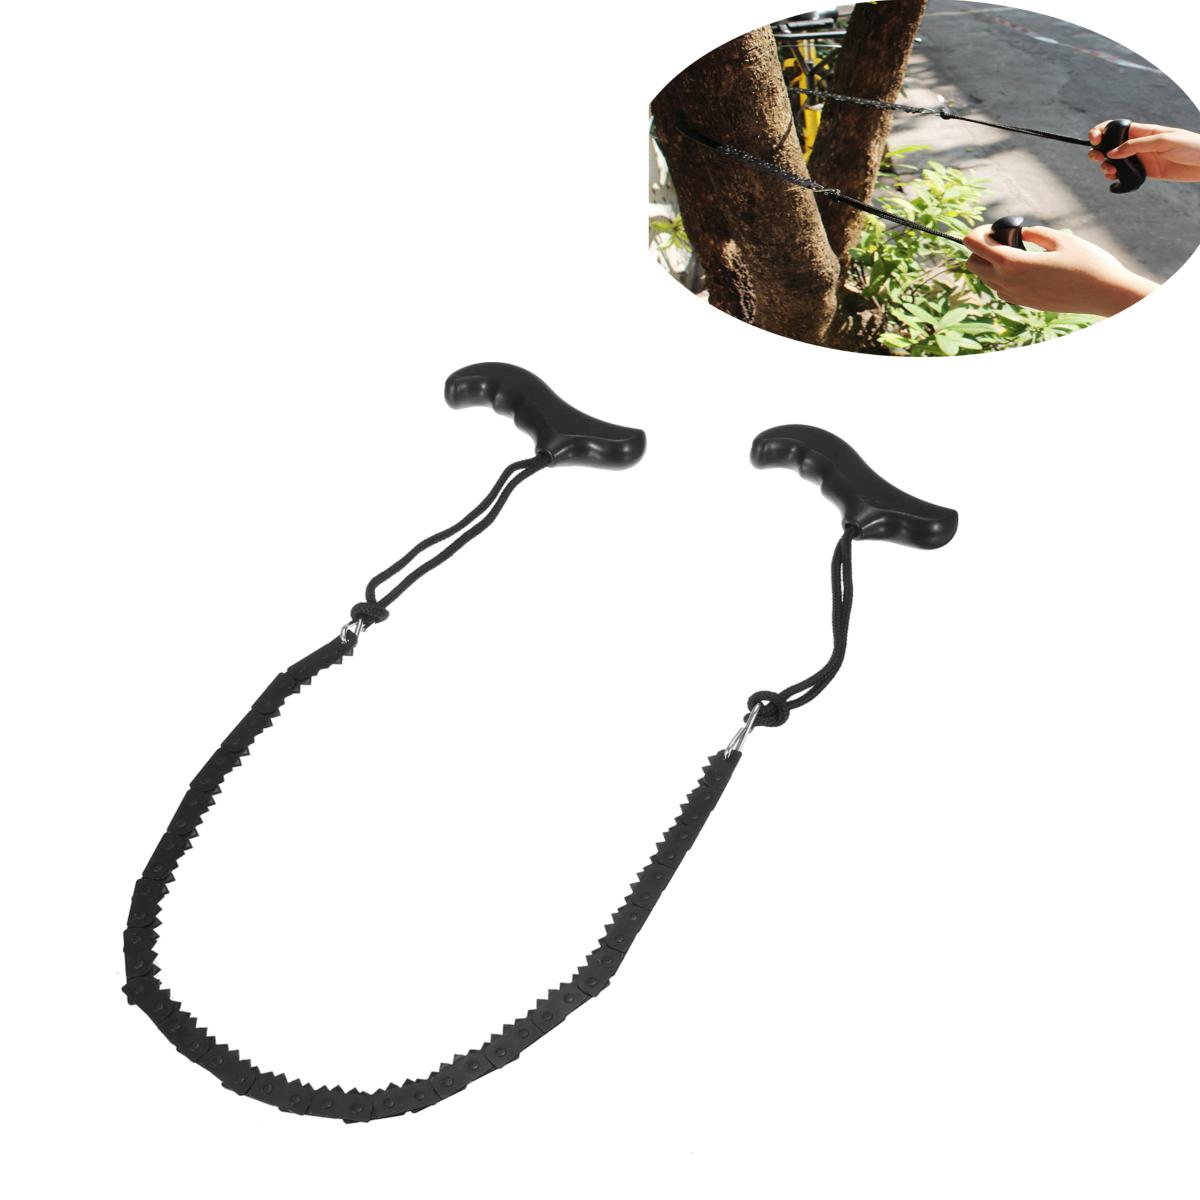 Pocket Foldable Chain Saw Chain Gear Garden Camping Eme